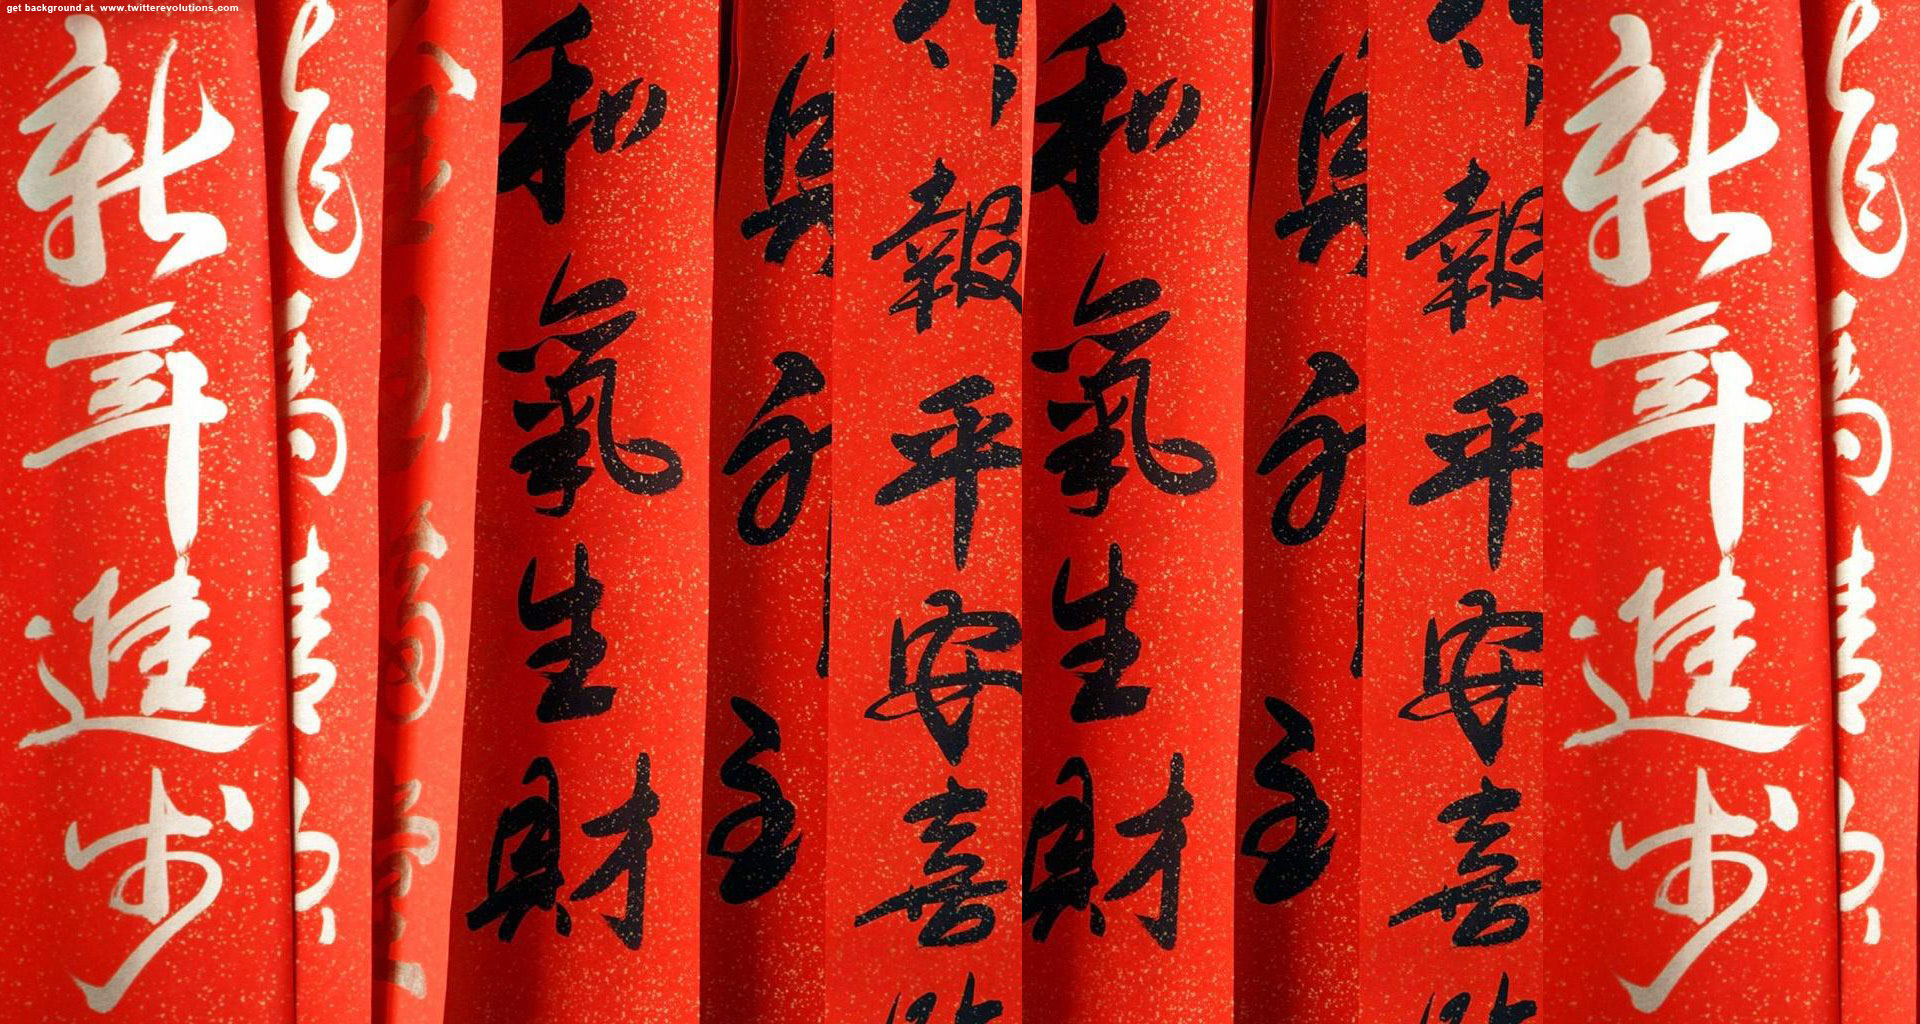 japanese writing wallpaper Kanji wallpaper with quirky japanese phrases mukashi mukashi aru tokoro ni hara ga hetta kuma ga sunde imashita.